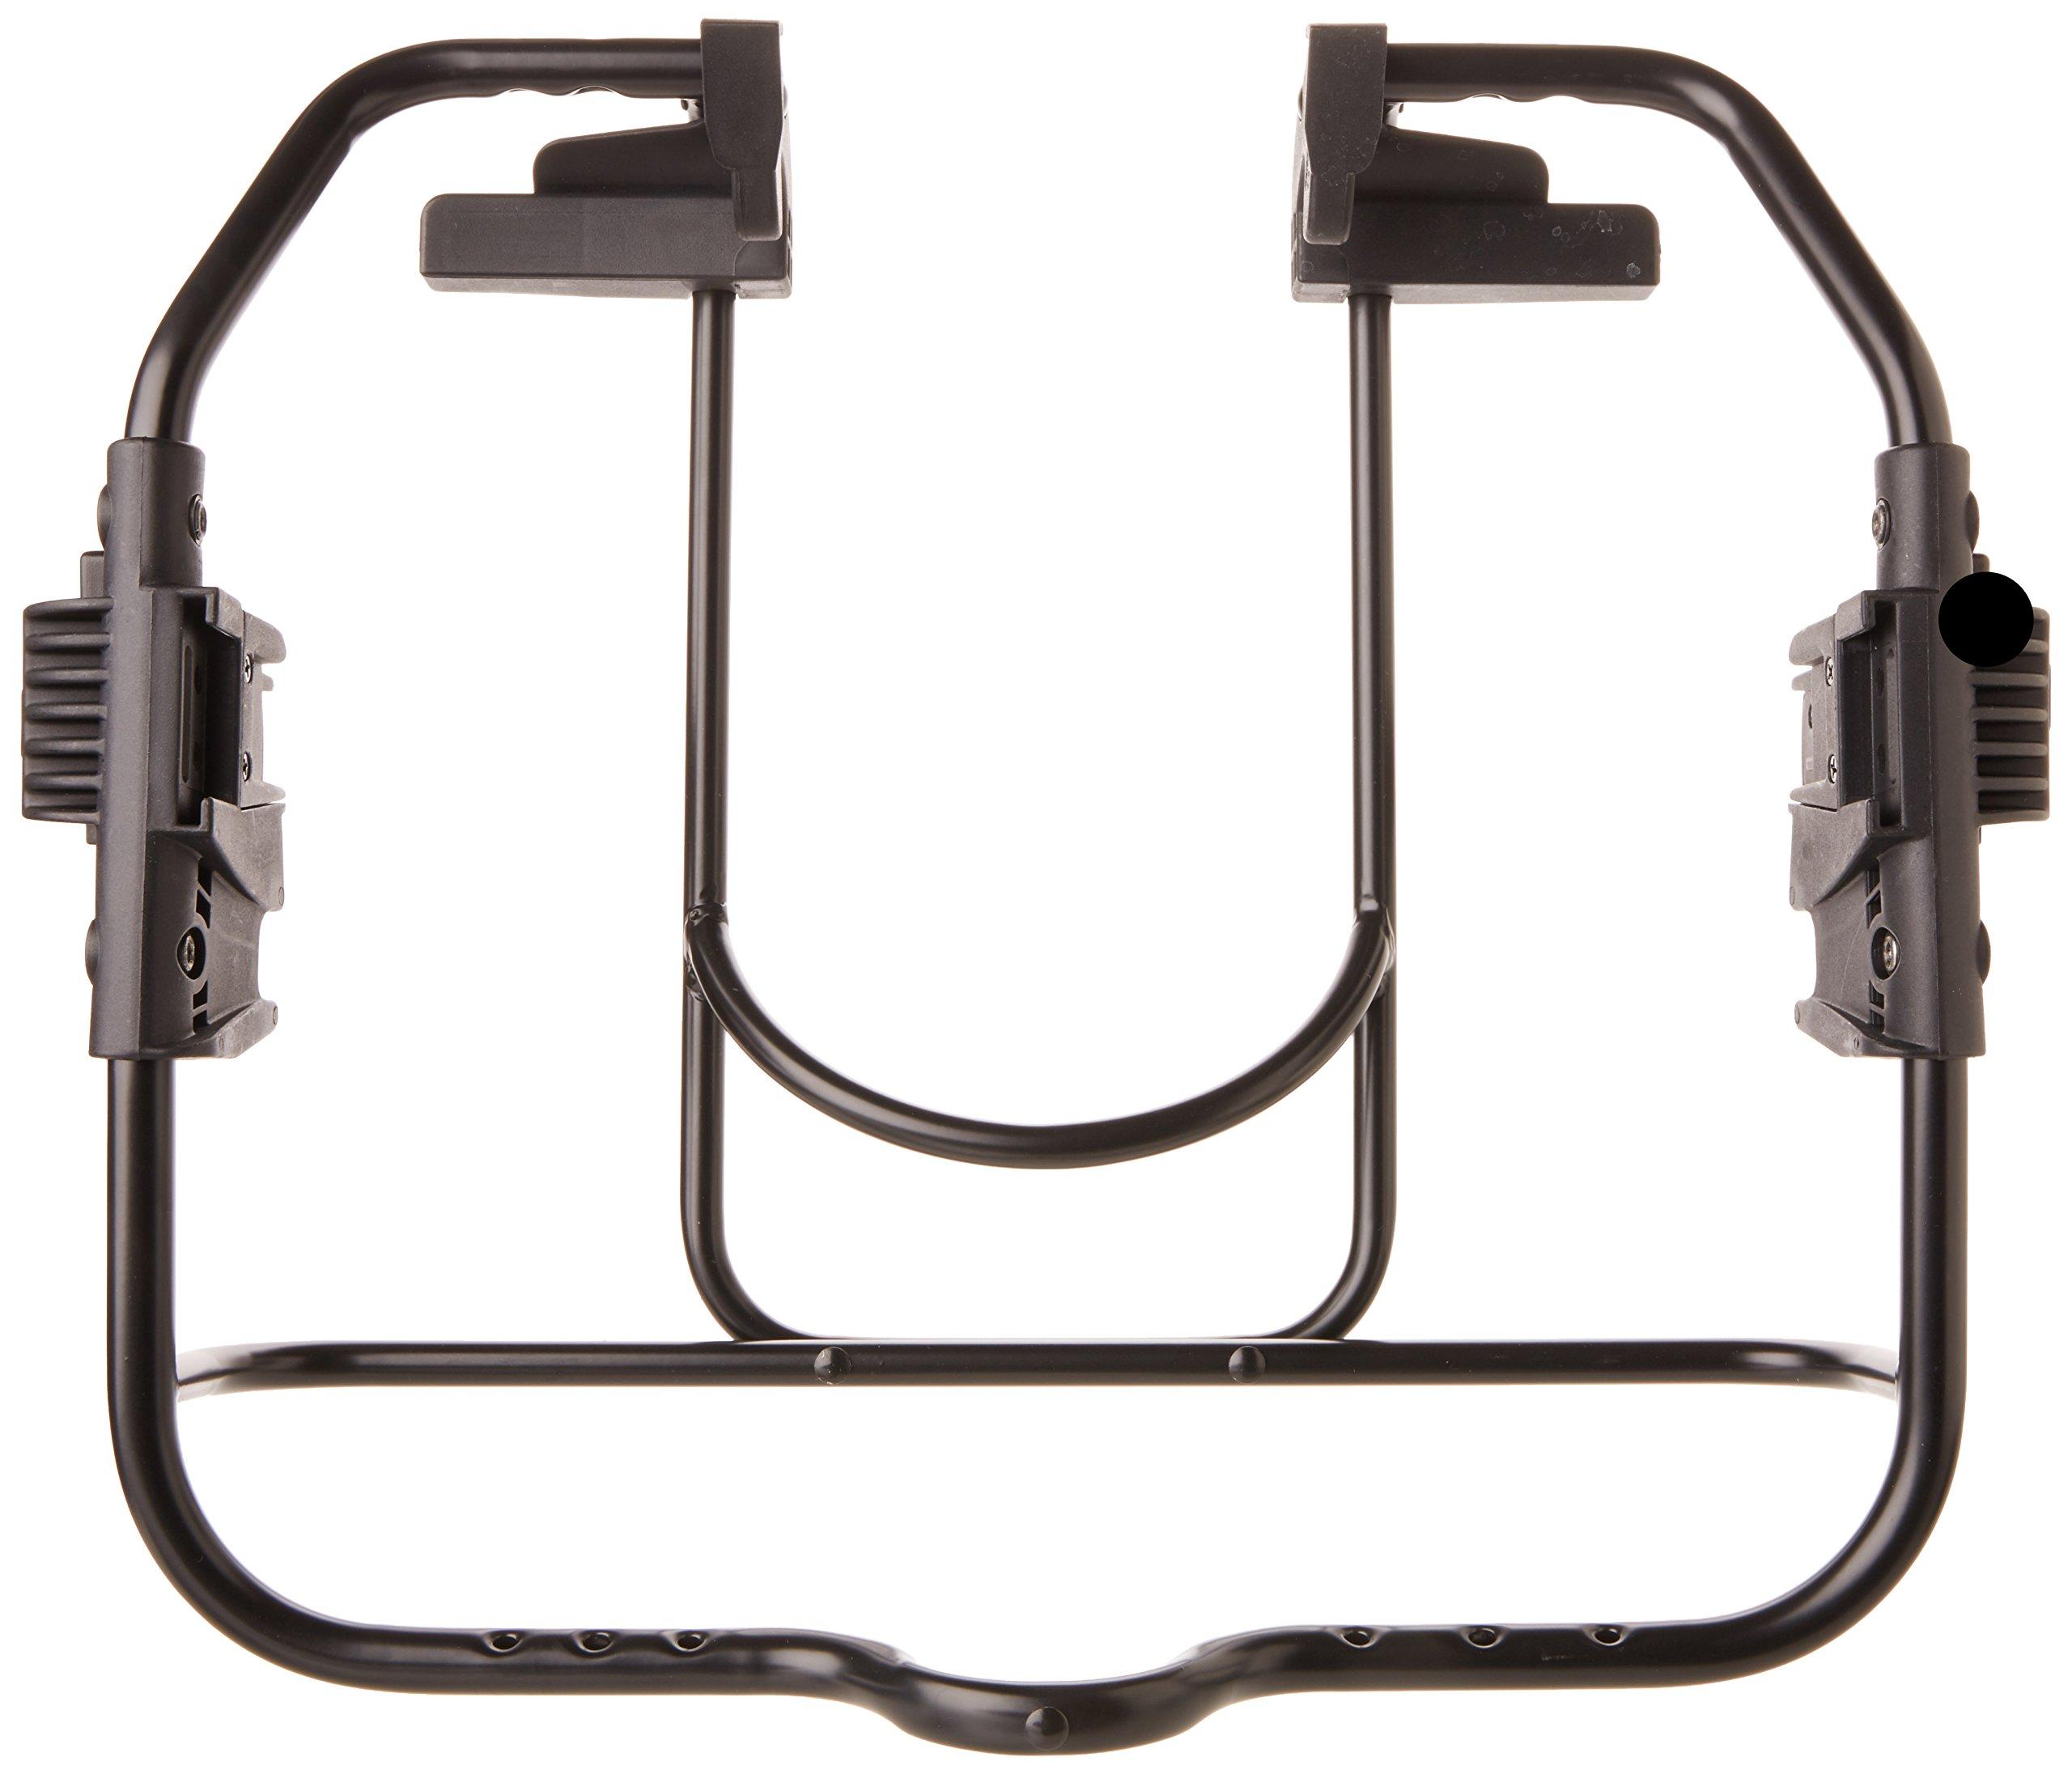 Quinny Moodd Universal ICS Adapter, Black by Quinny (Image #1)